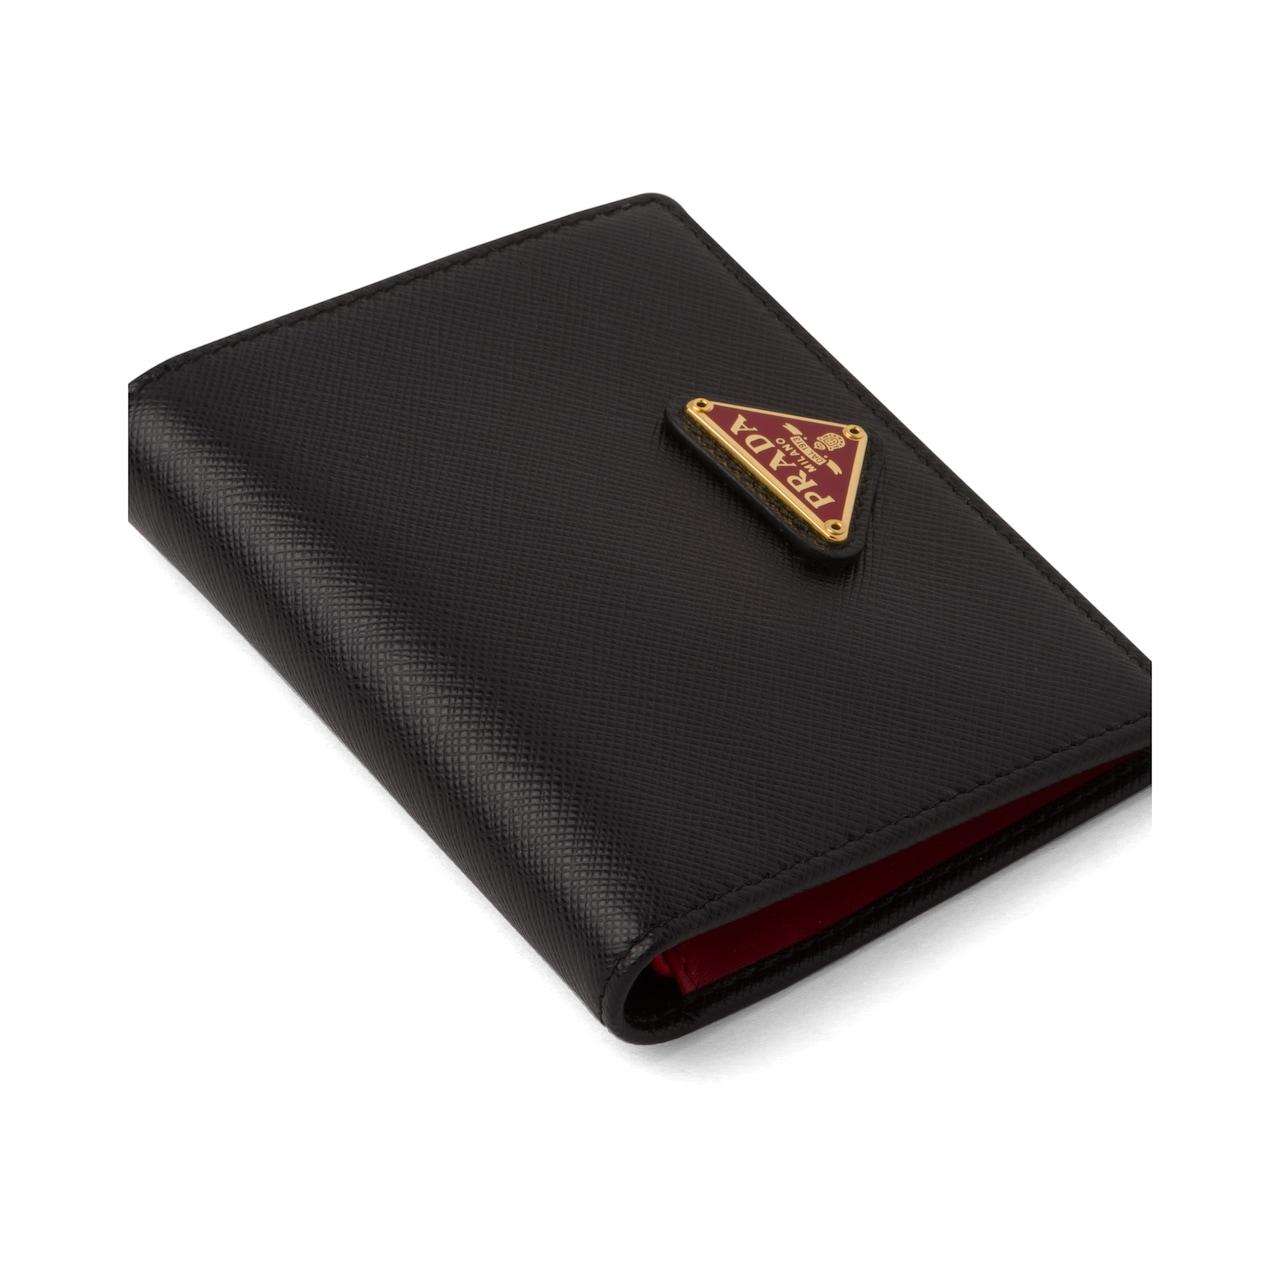 Prada Small Saffiano leather wallet 6